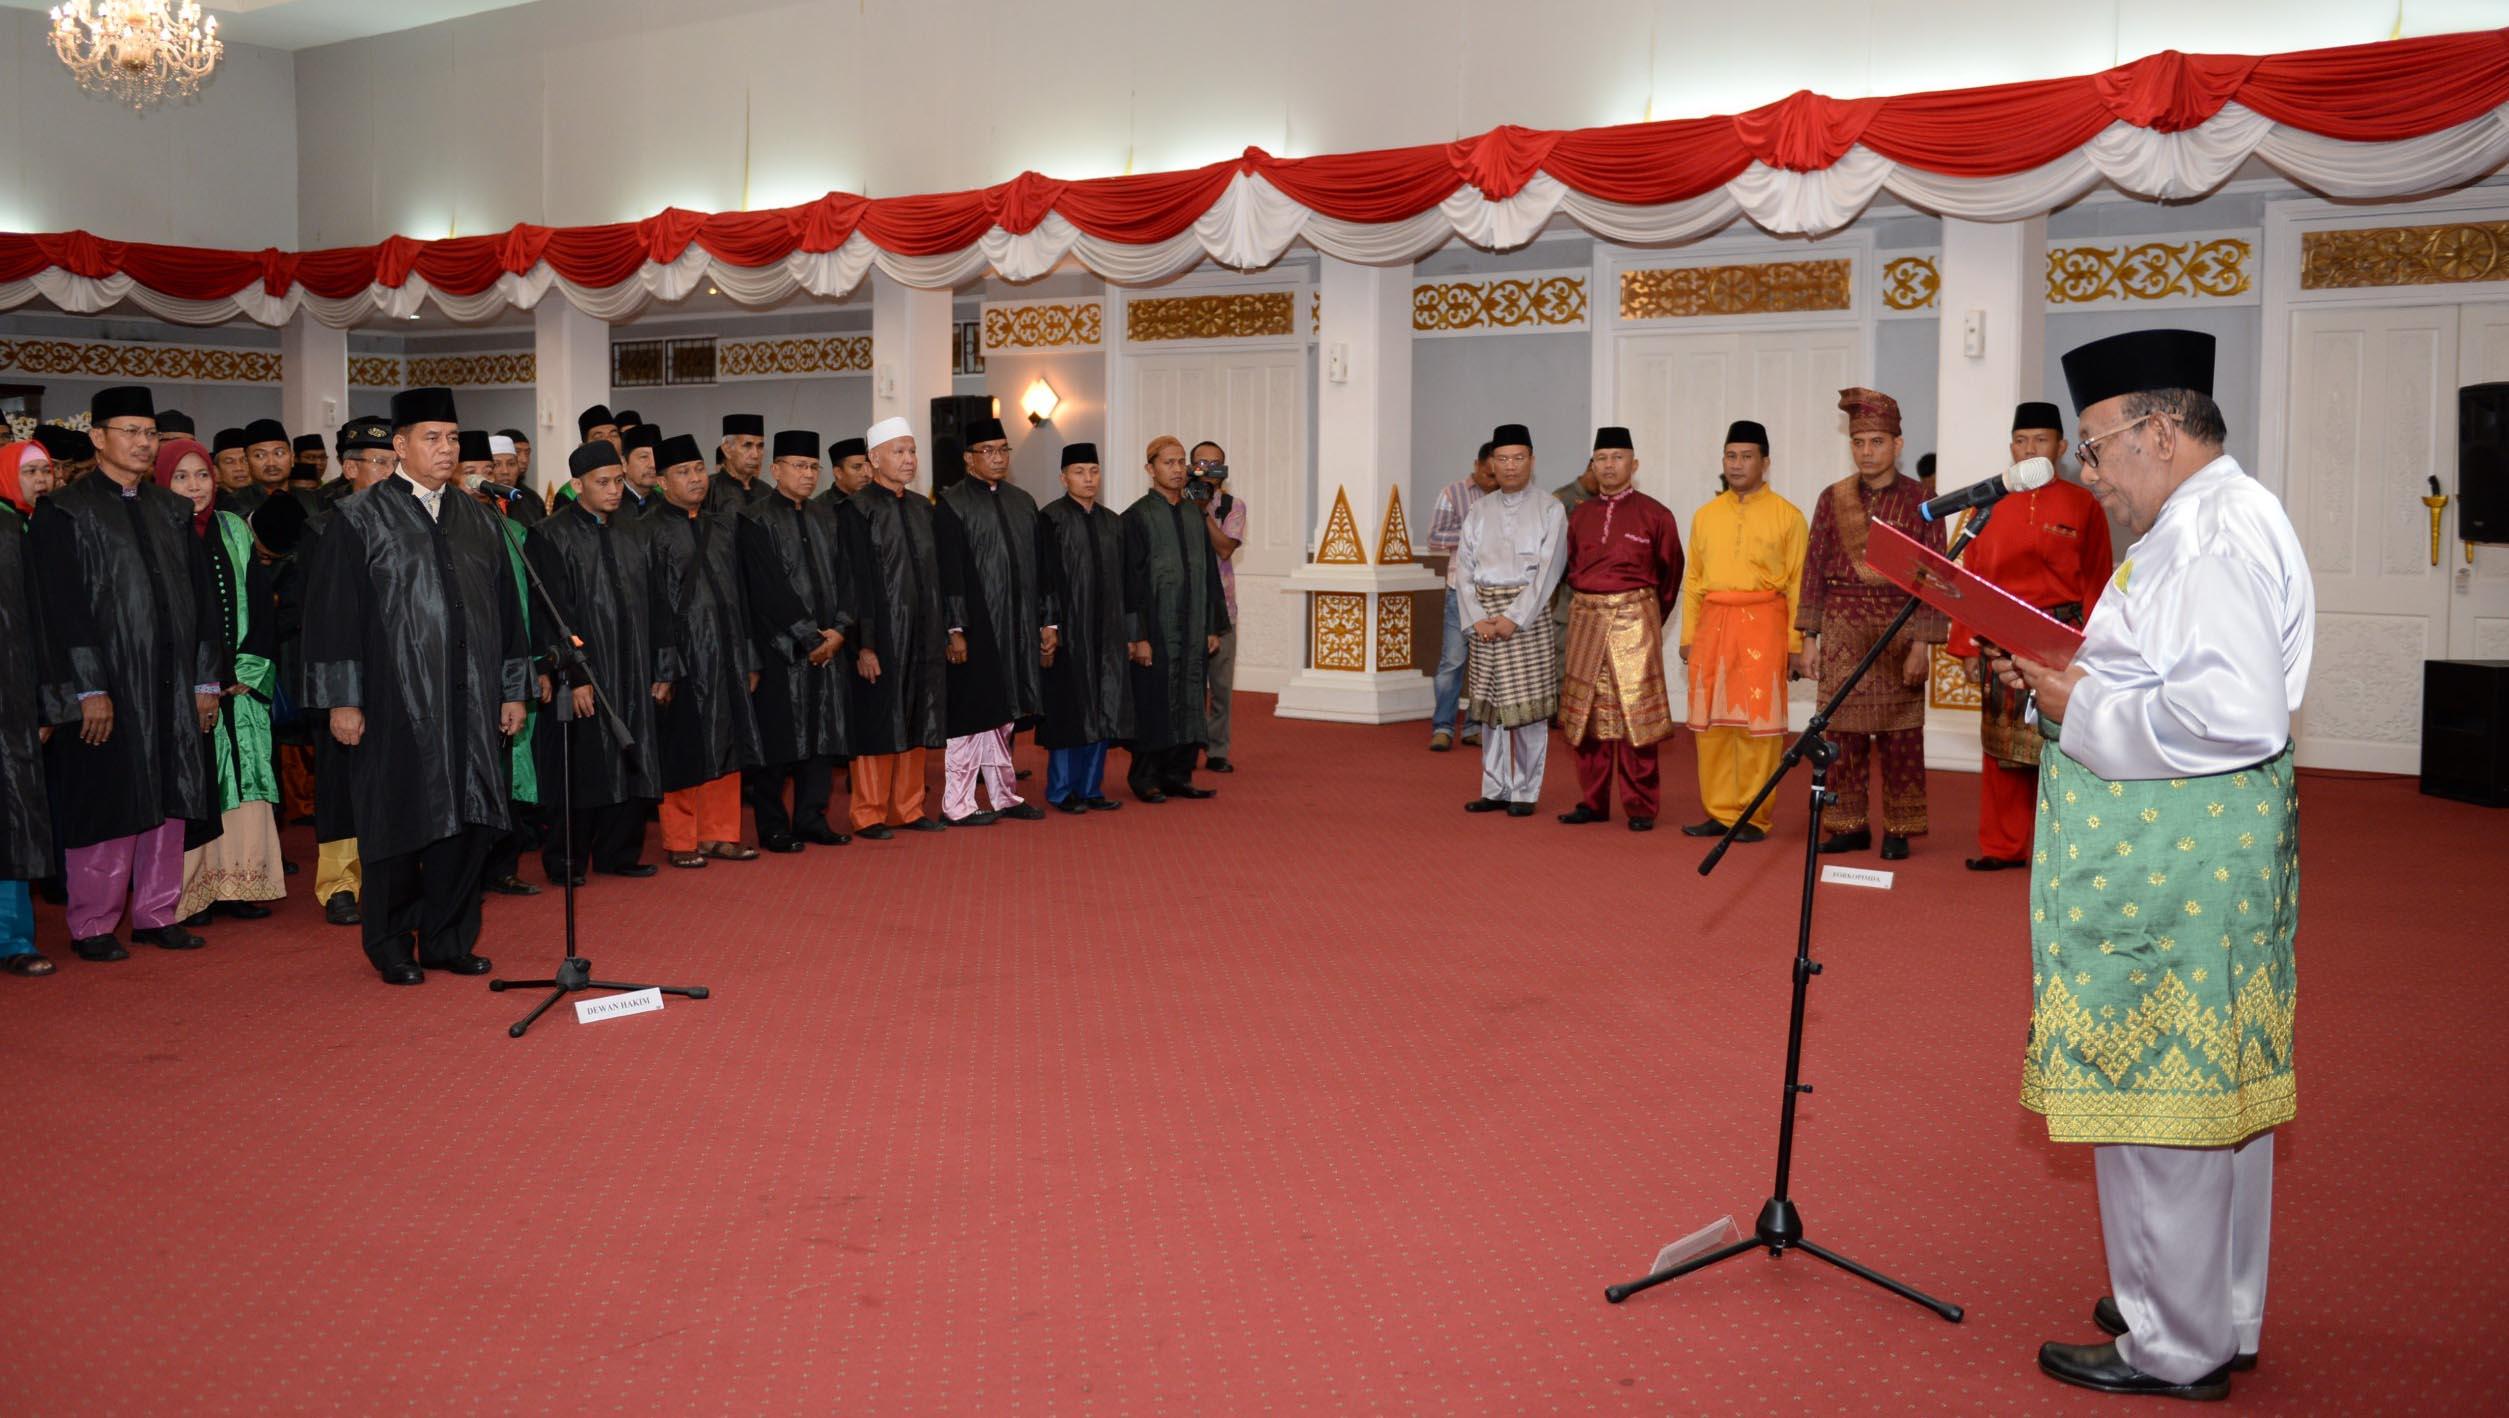 Gubri H Wan Thamrin Hasyim Hadir Sekaligus Melantik Dewan Hakim Dan Malam Taaruf Dalam Rangka MTQ XXXVII Prov. Riau Tahun 2018, Di Gedung Daerah Balai Serindit